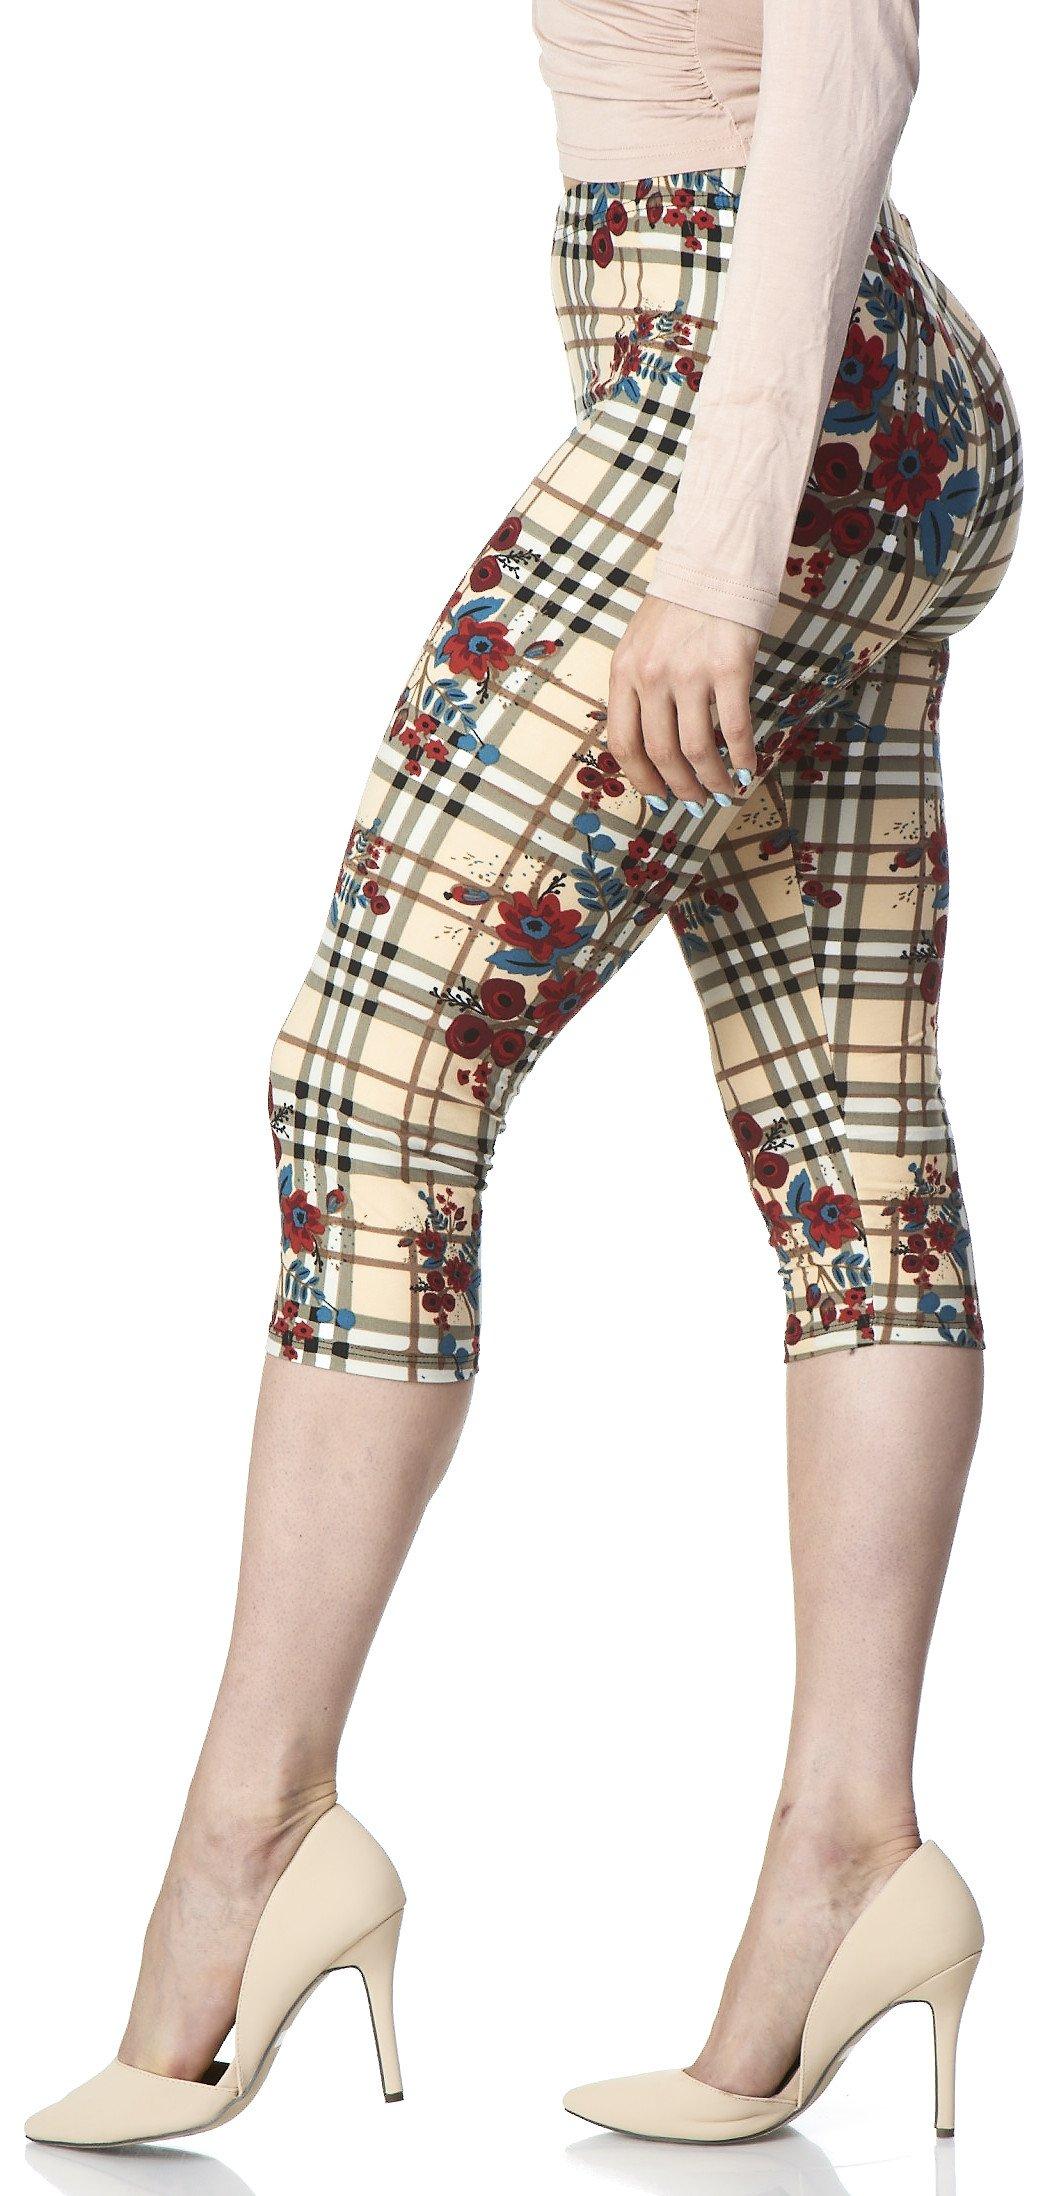 LMB Lush Moda Extra Soft Leggings with Designs- Variety of Prints - Floral Plaid - W J076CA